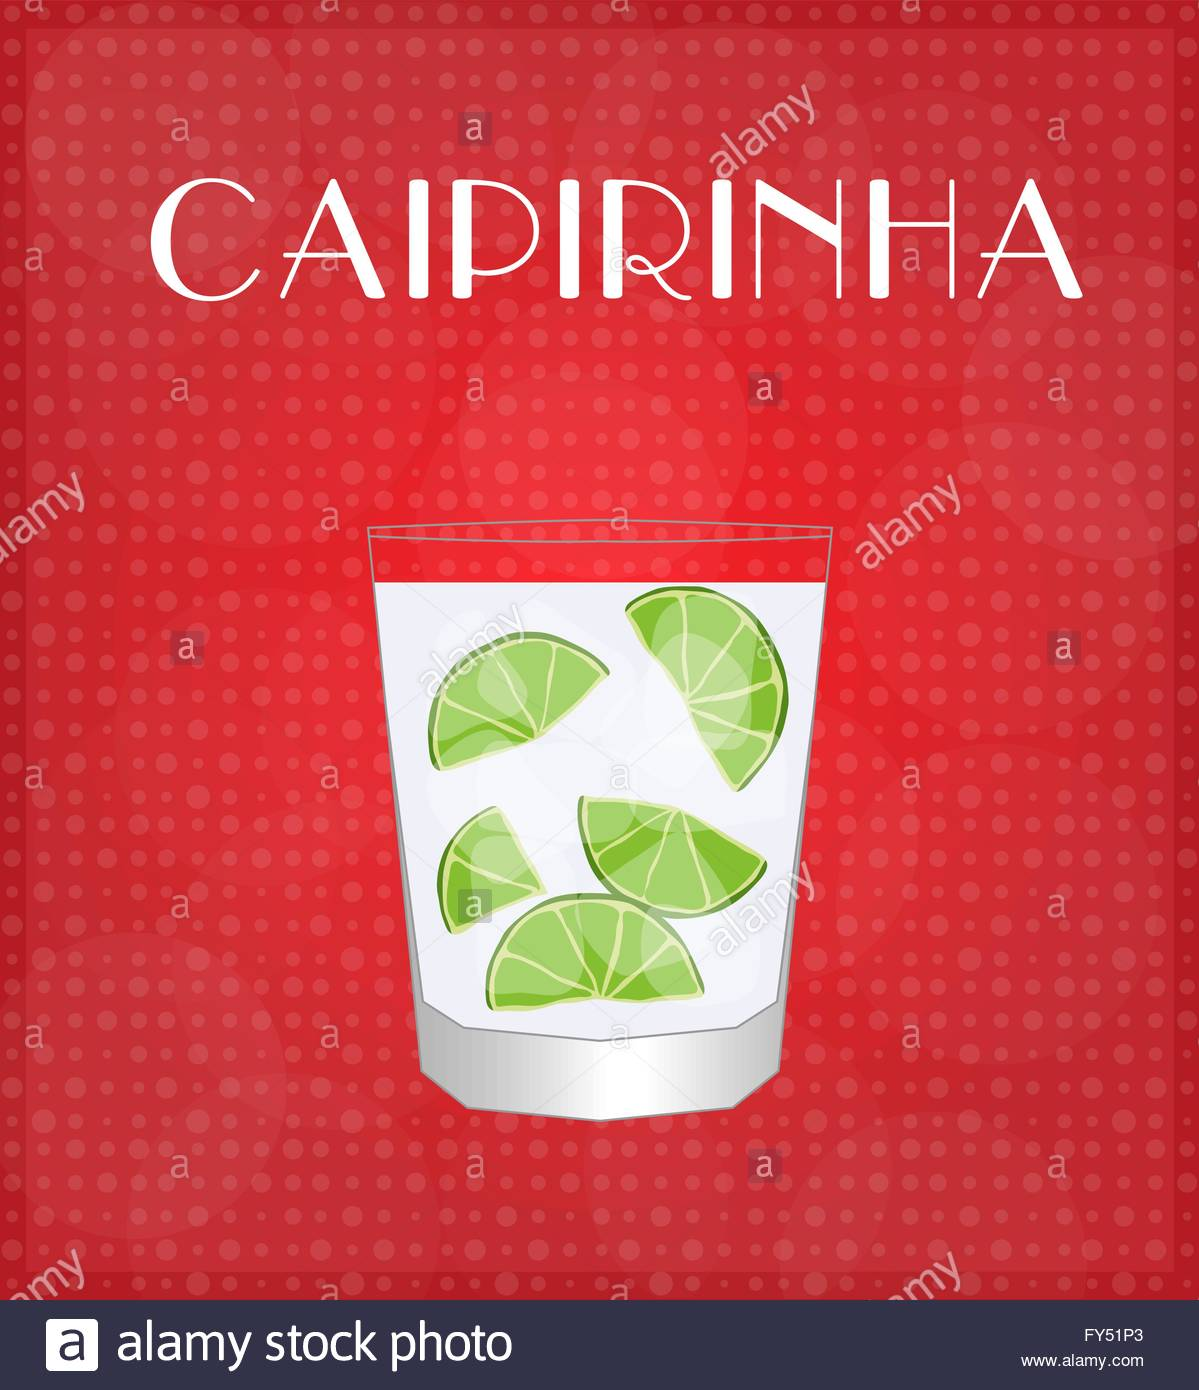 Getränke Liste Caipirinha mit rotem EPS10 Vektor Abbildung - Bild ...